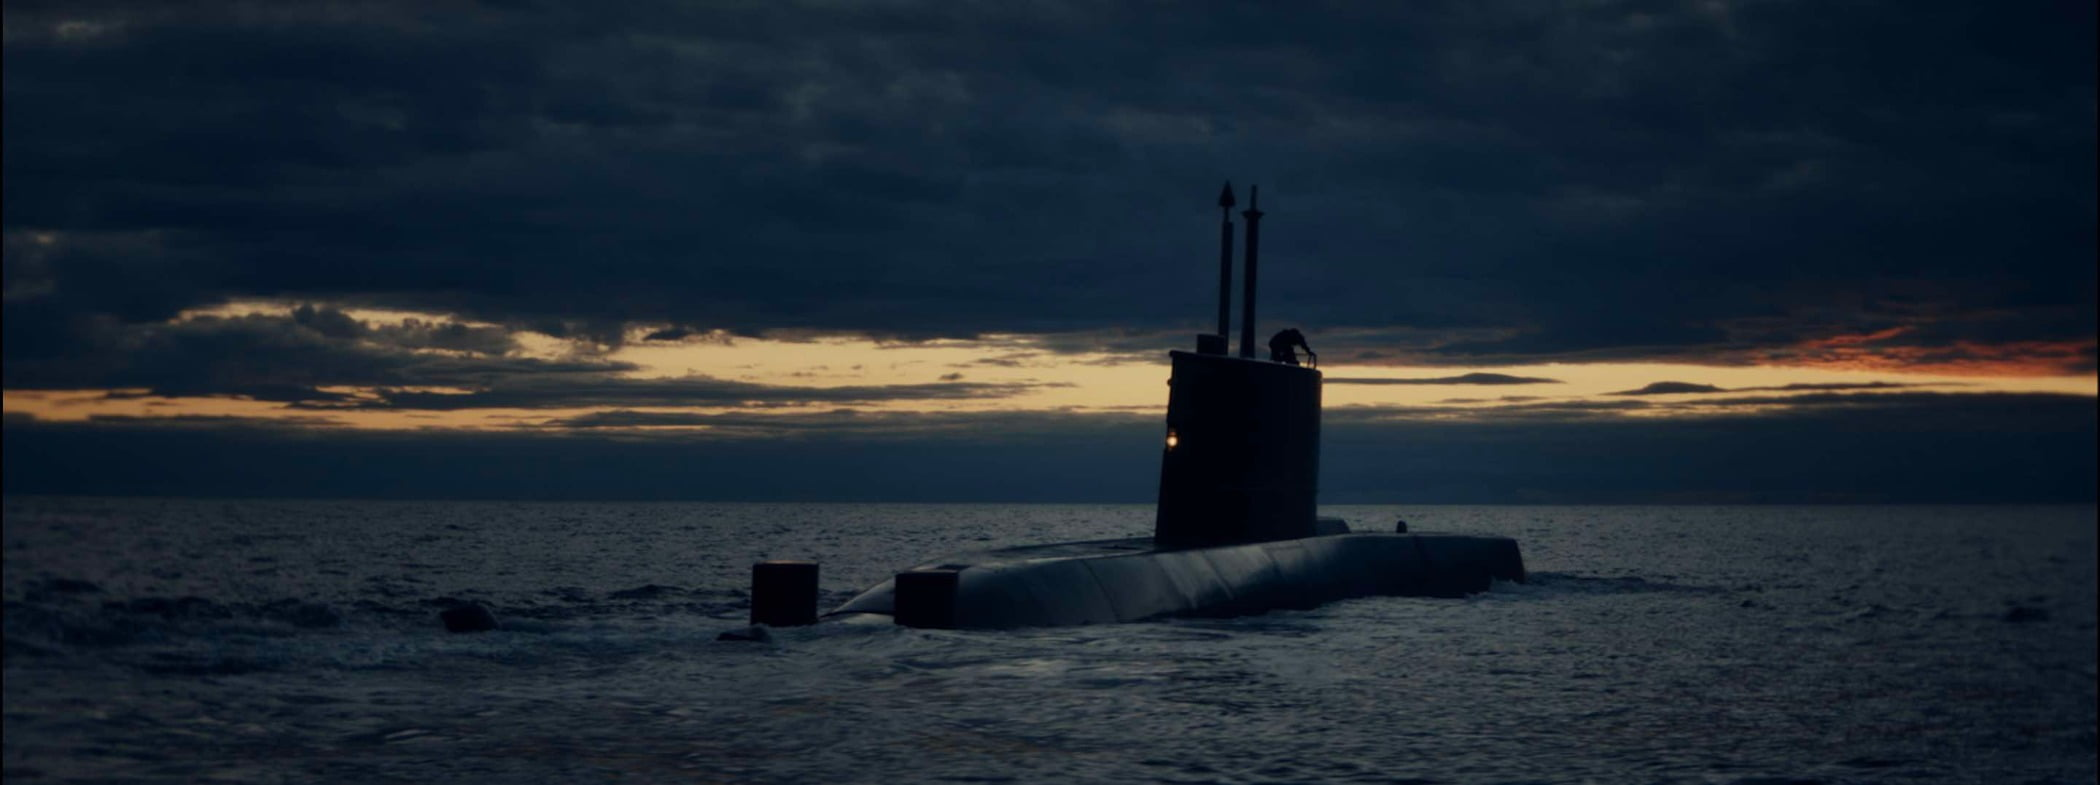 Ballistic missile submarine, Water, Sky, Cloud, Fluid, Boat, Watercraft